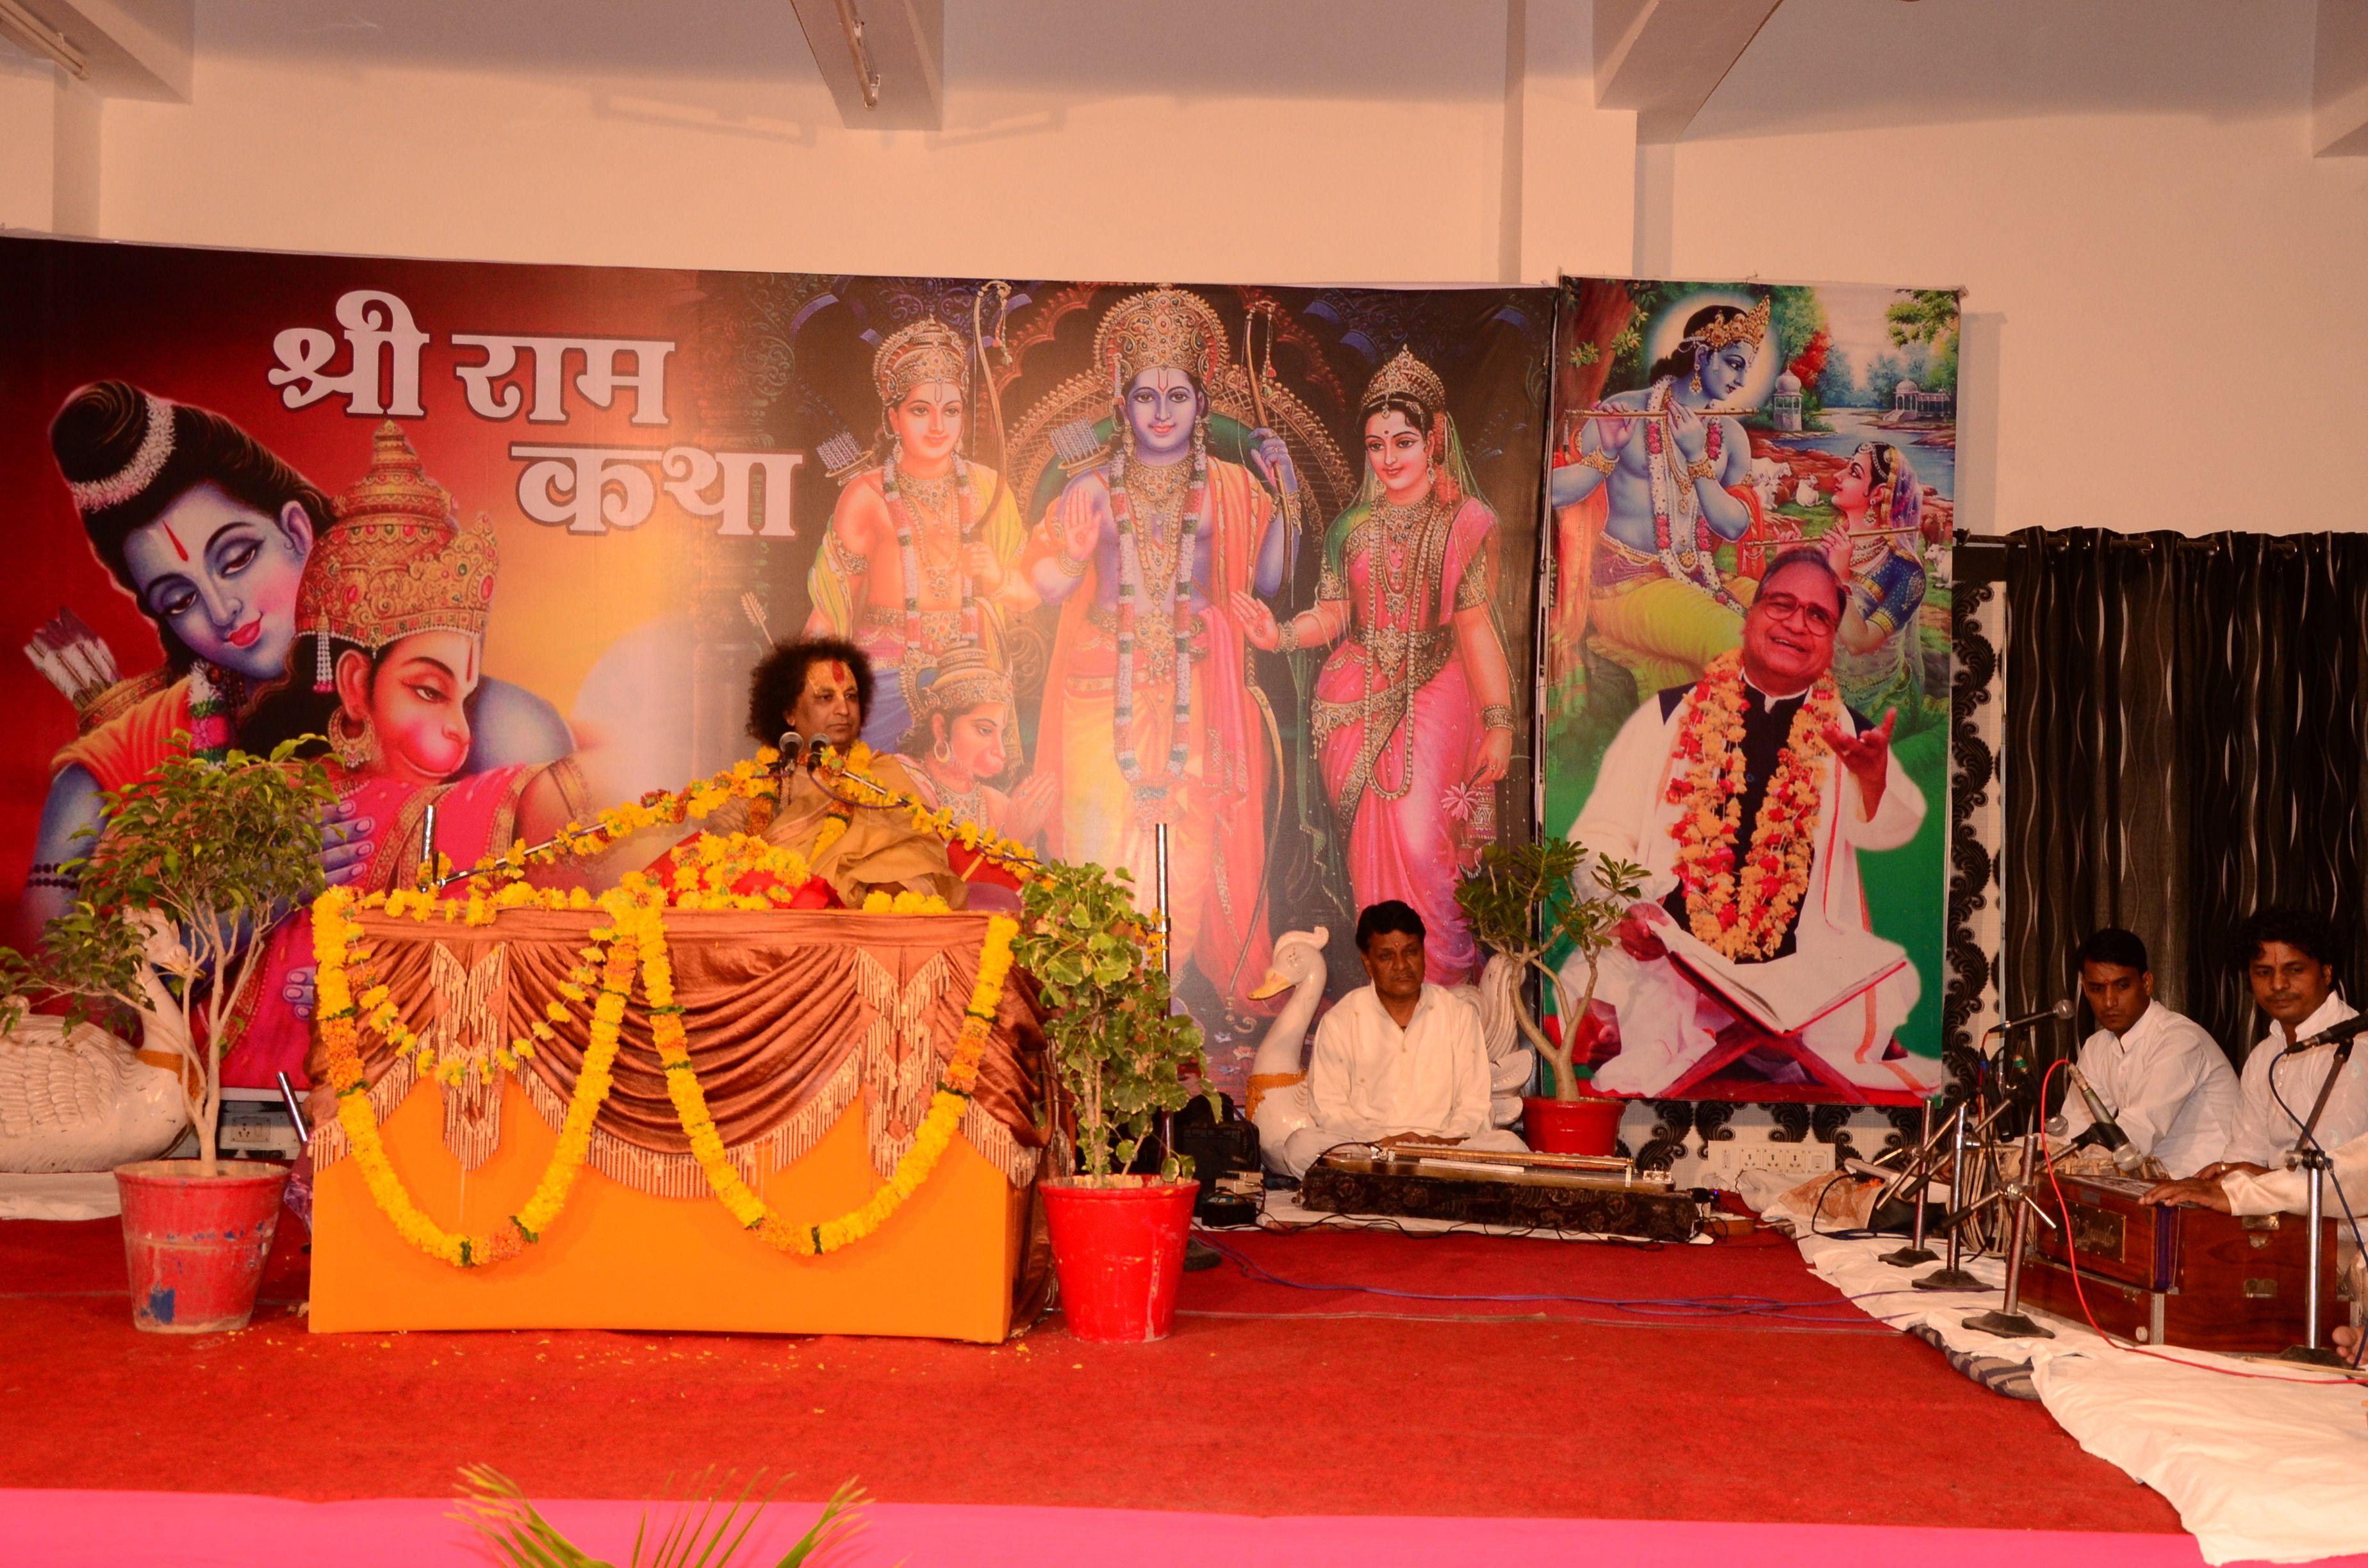 Enjoy Live Shri Ram katha on astha tv from 10 am to 1 pm